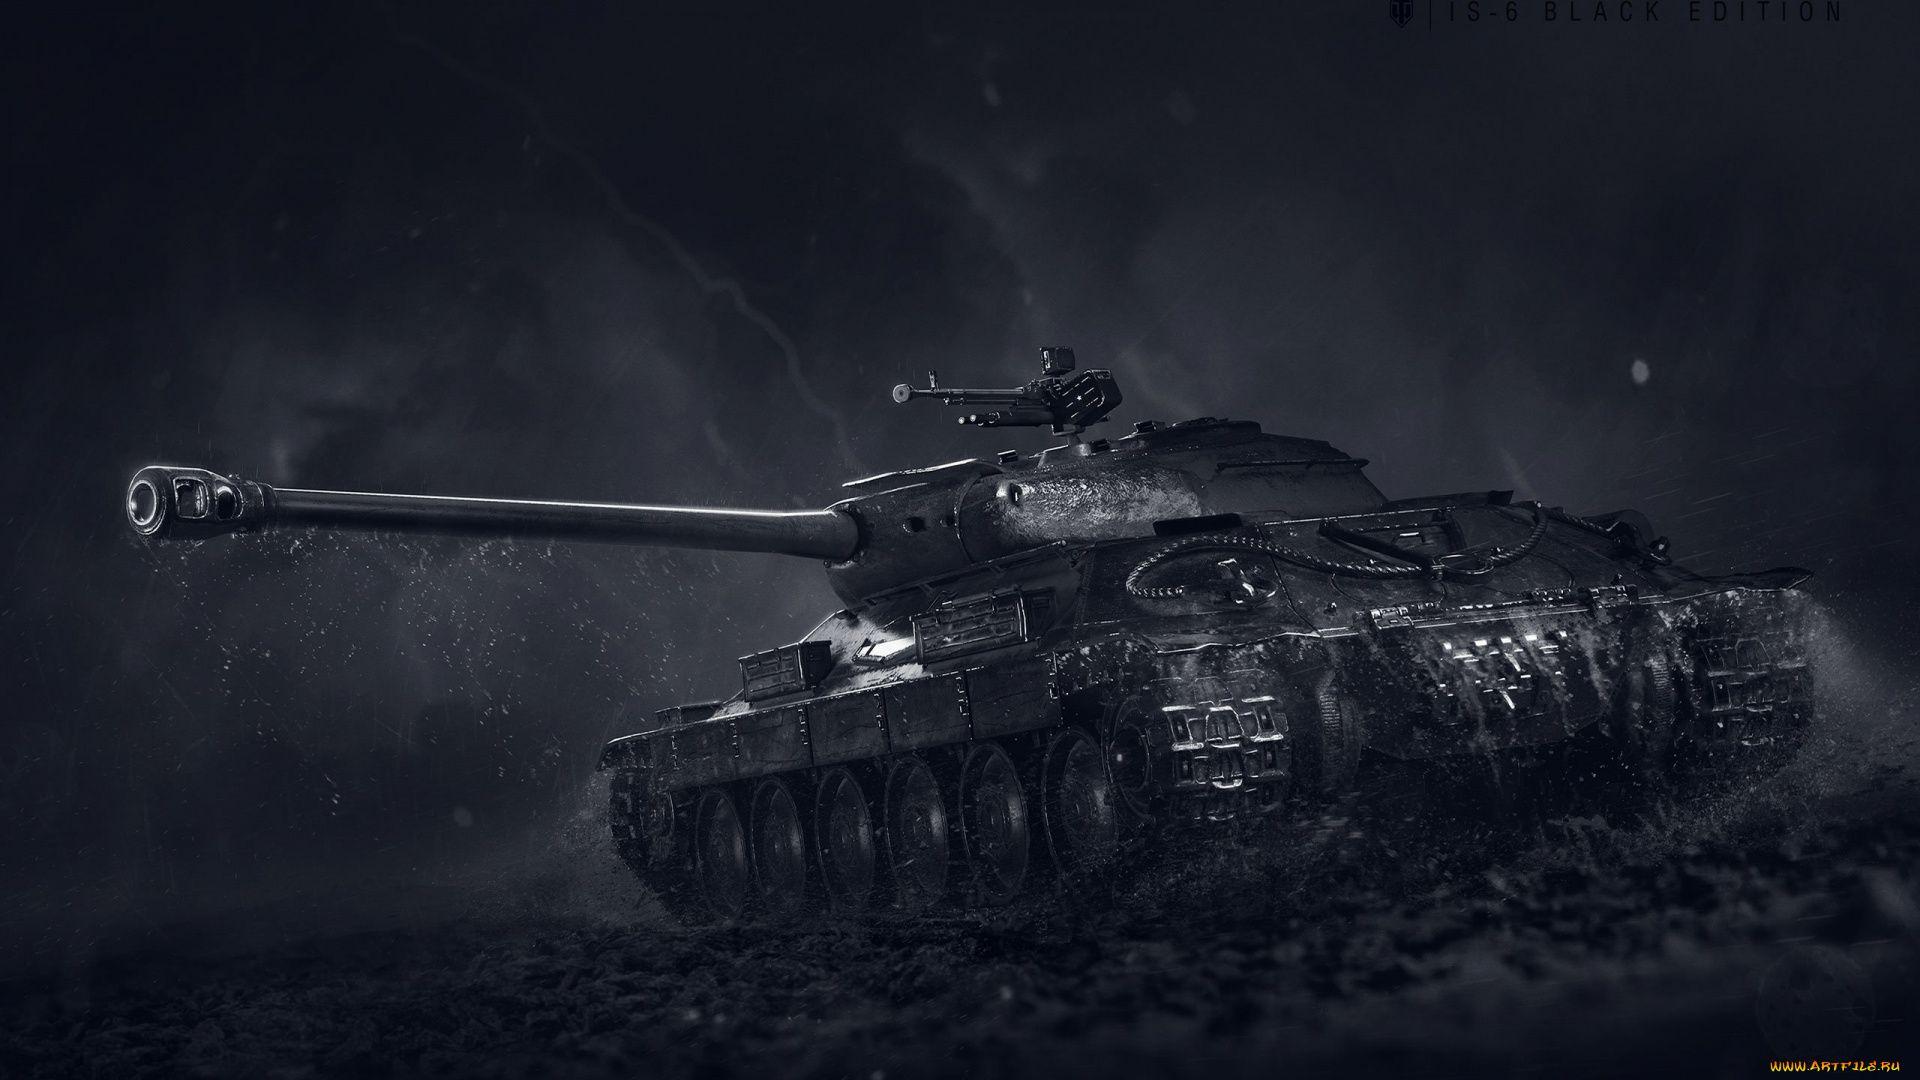 Tank computer wallpaper